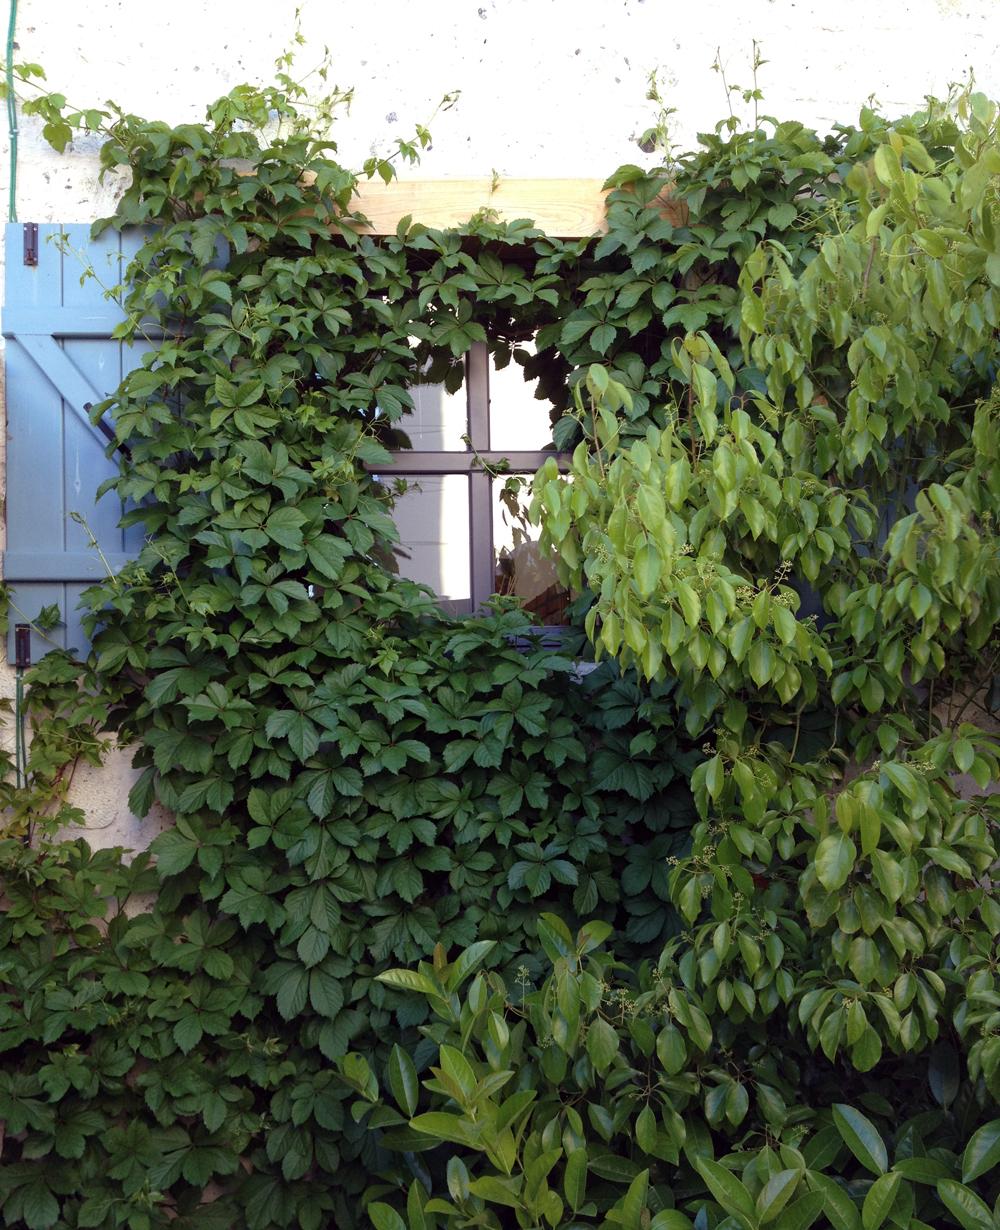 OZRN HOUSE I ALACATI